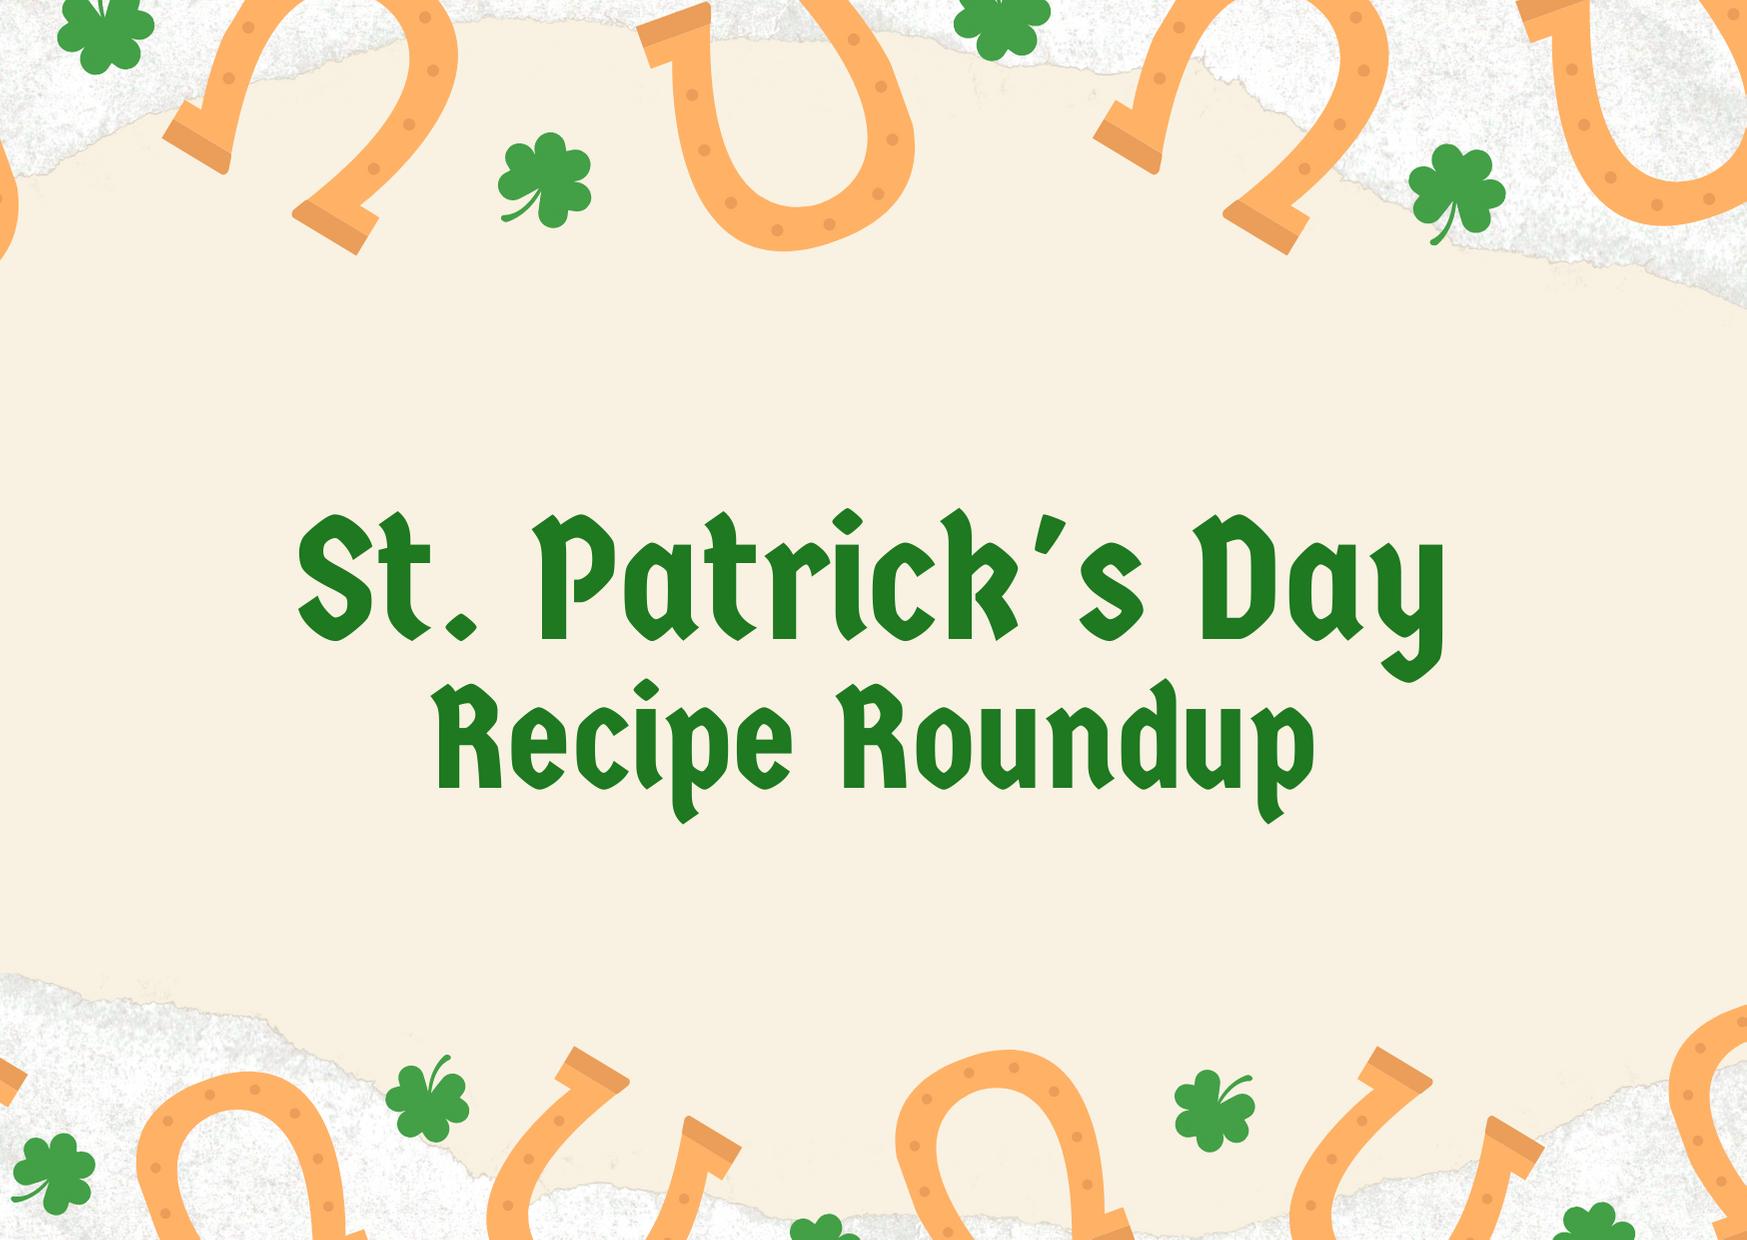 St Patrick's Day Recipe Roundup